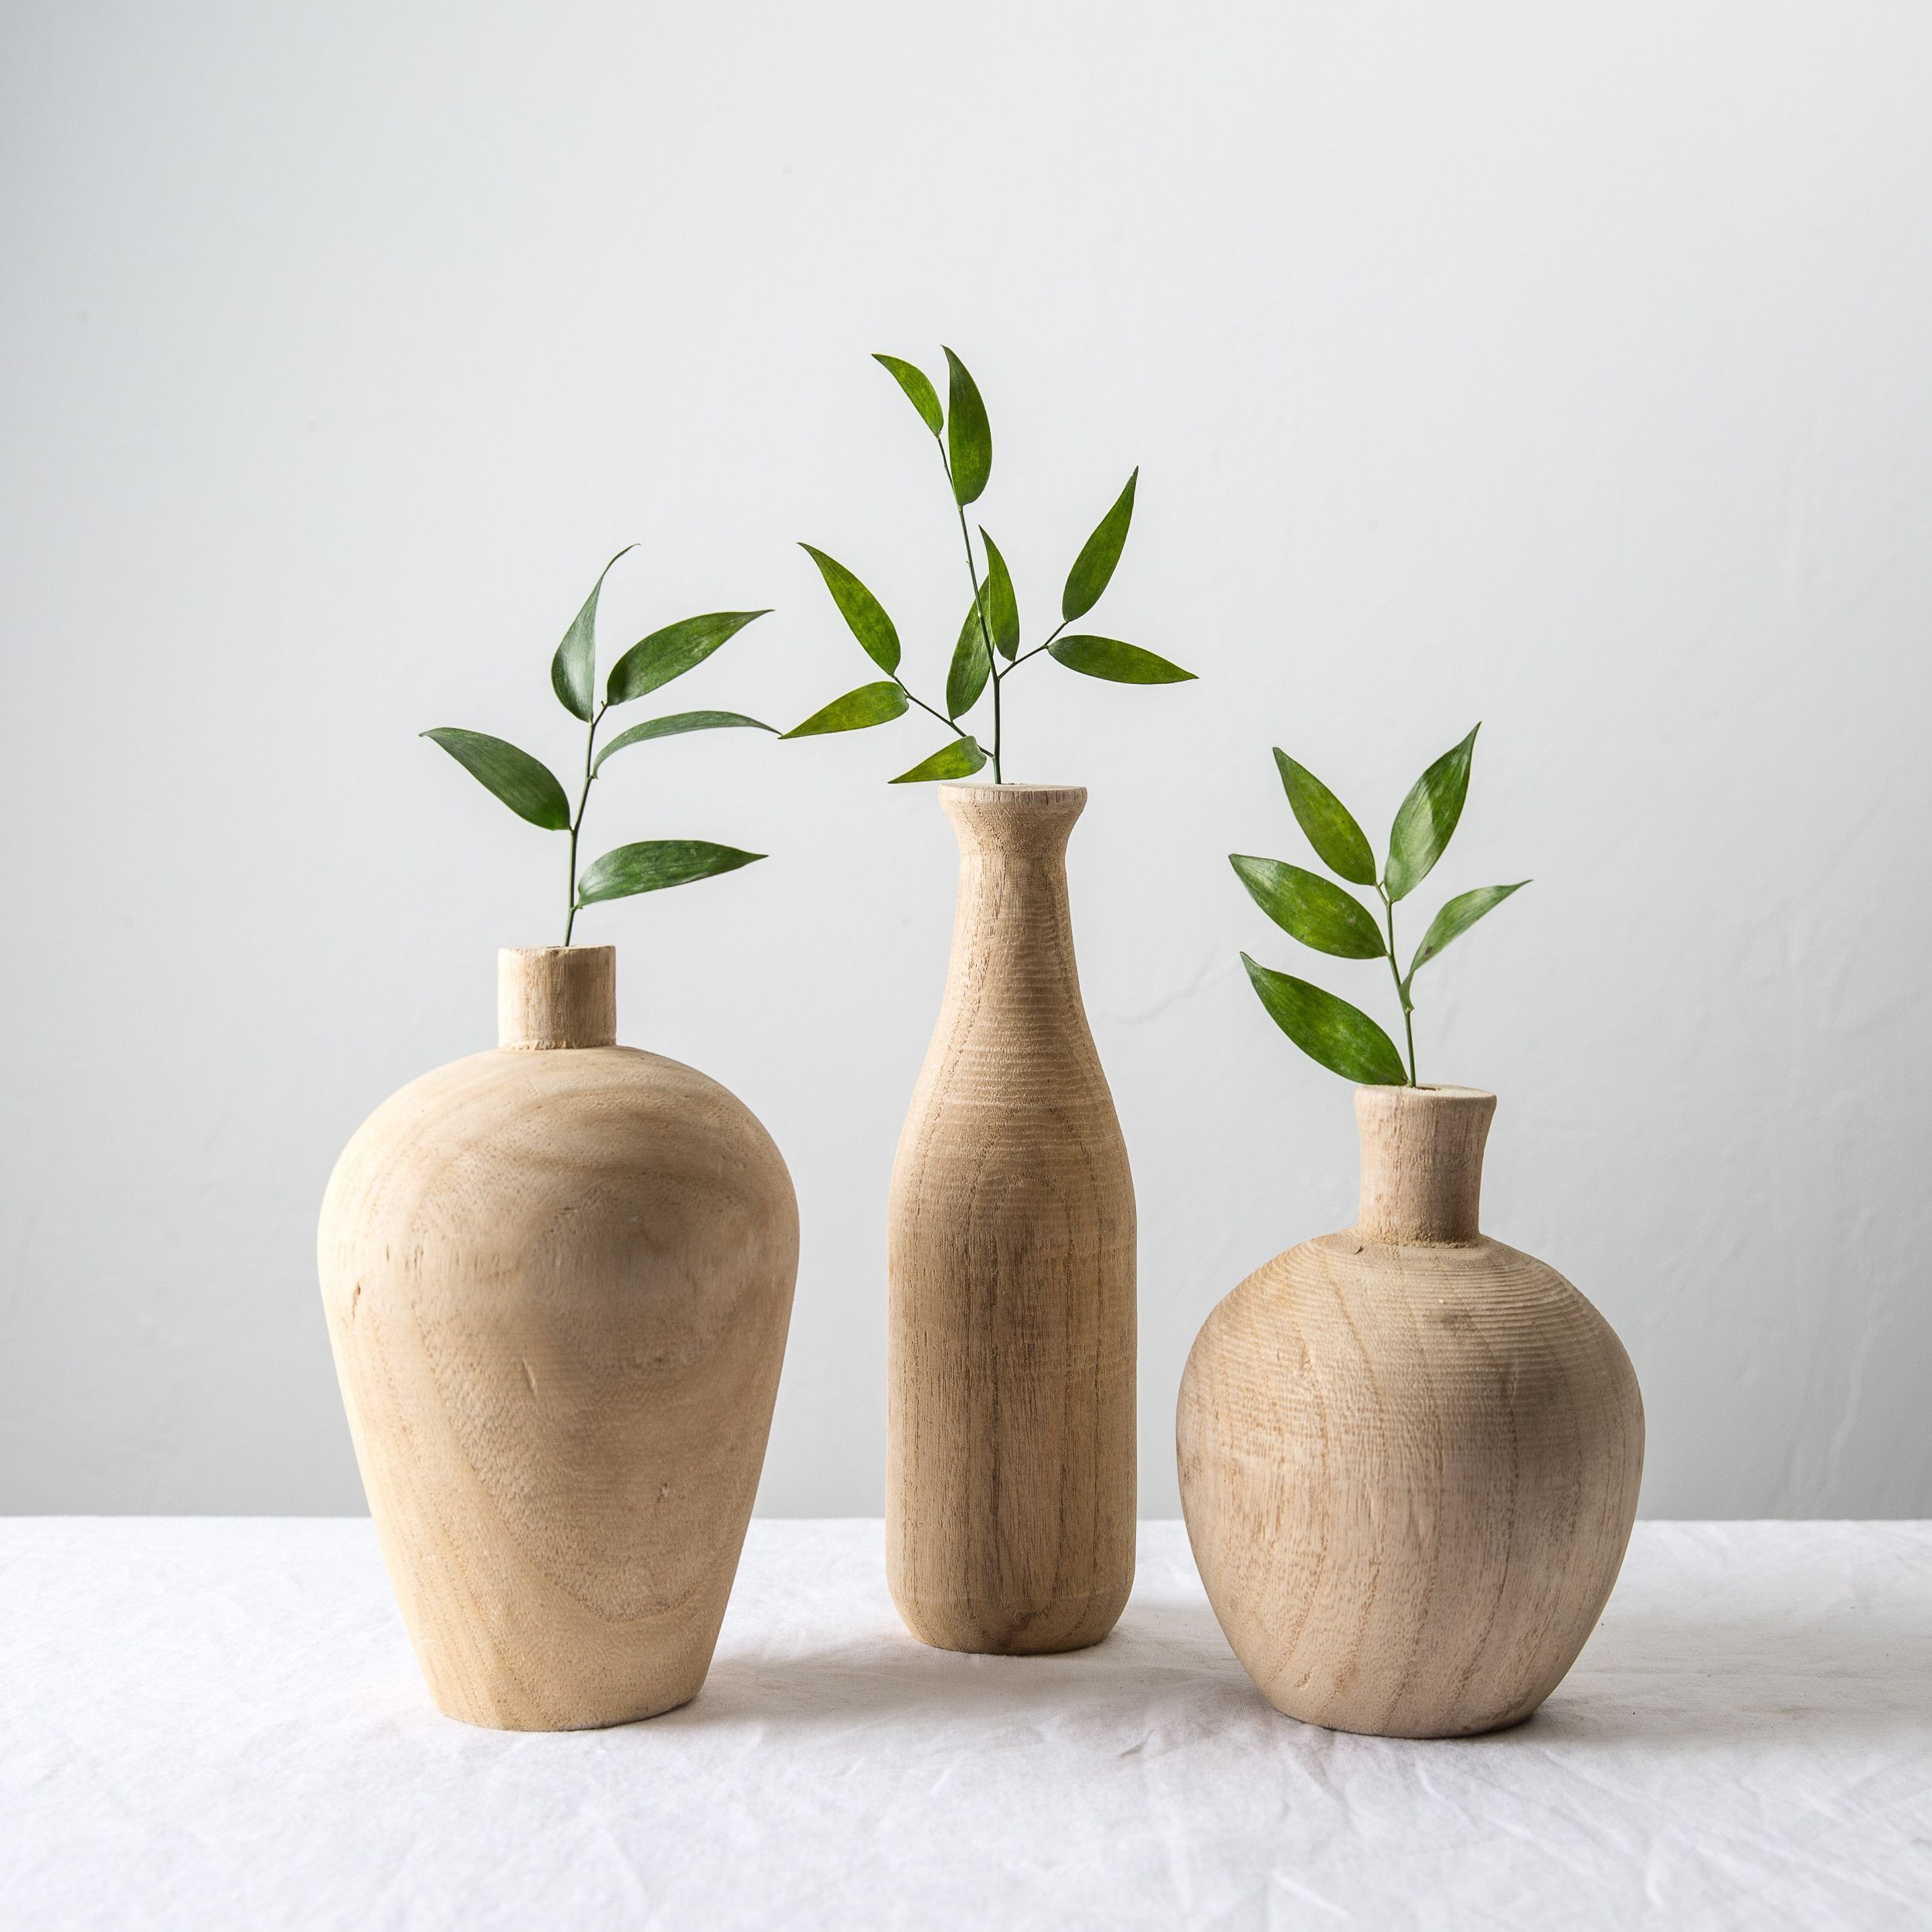 Large Wooden Vase Of 17 Unique Extra Large Vase Bogekompresorturkiye Com within the Paulownia Wood Vase is A Natural Wooden Vase that Es In Three Different Shapes